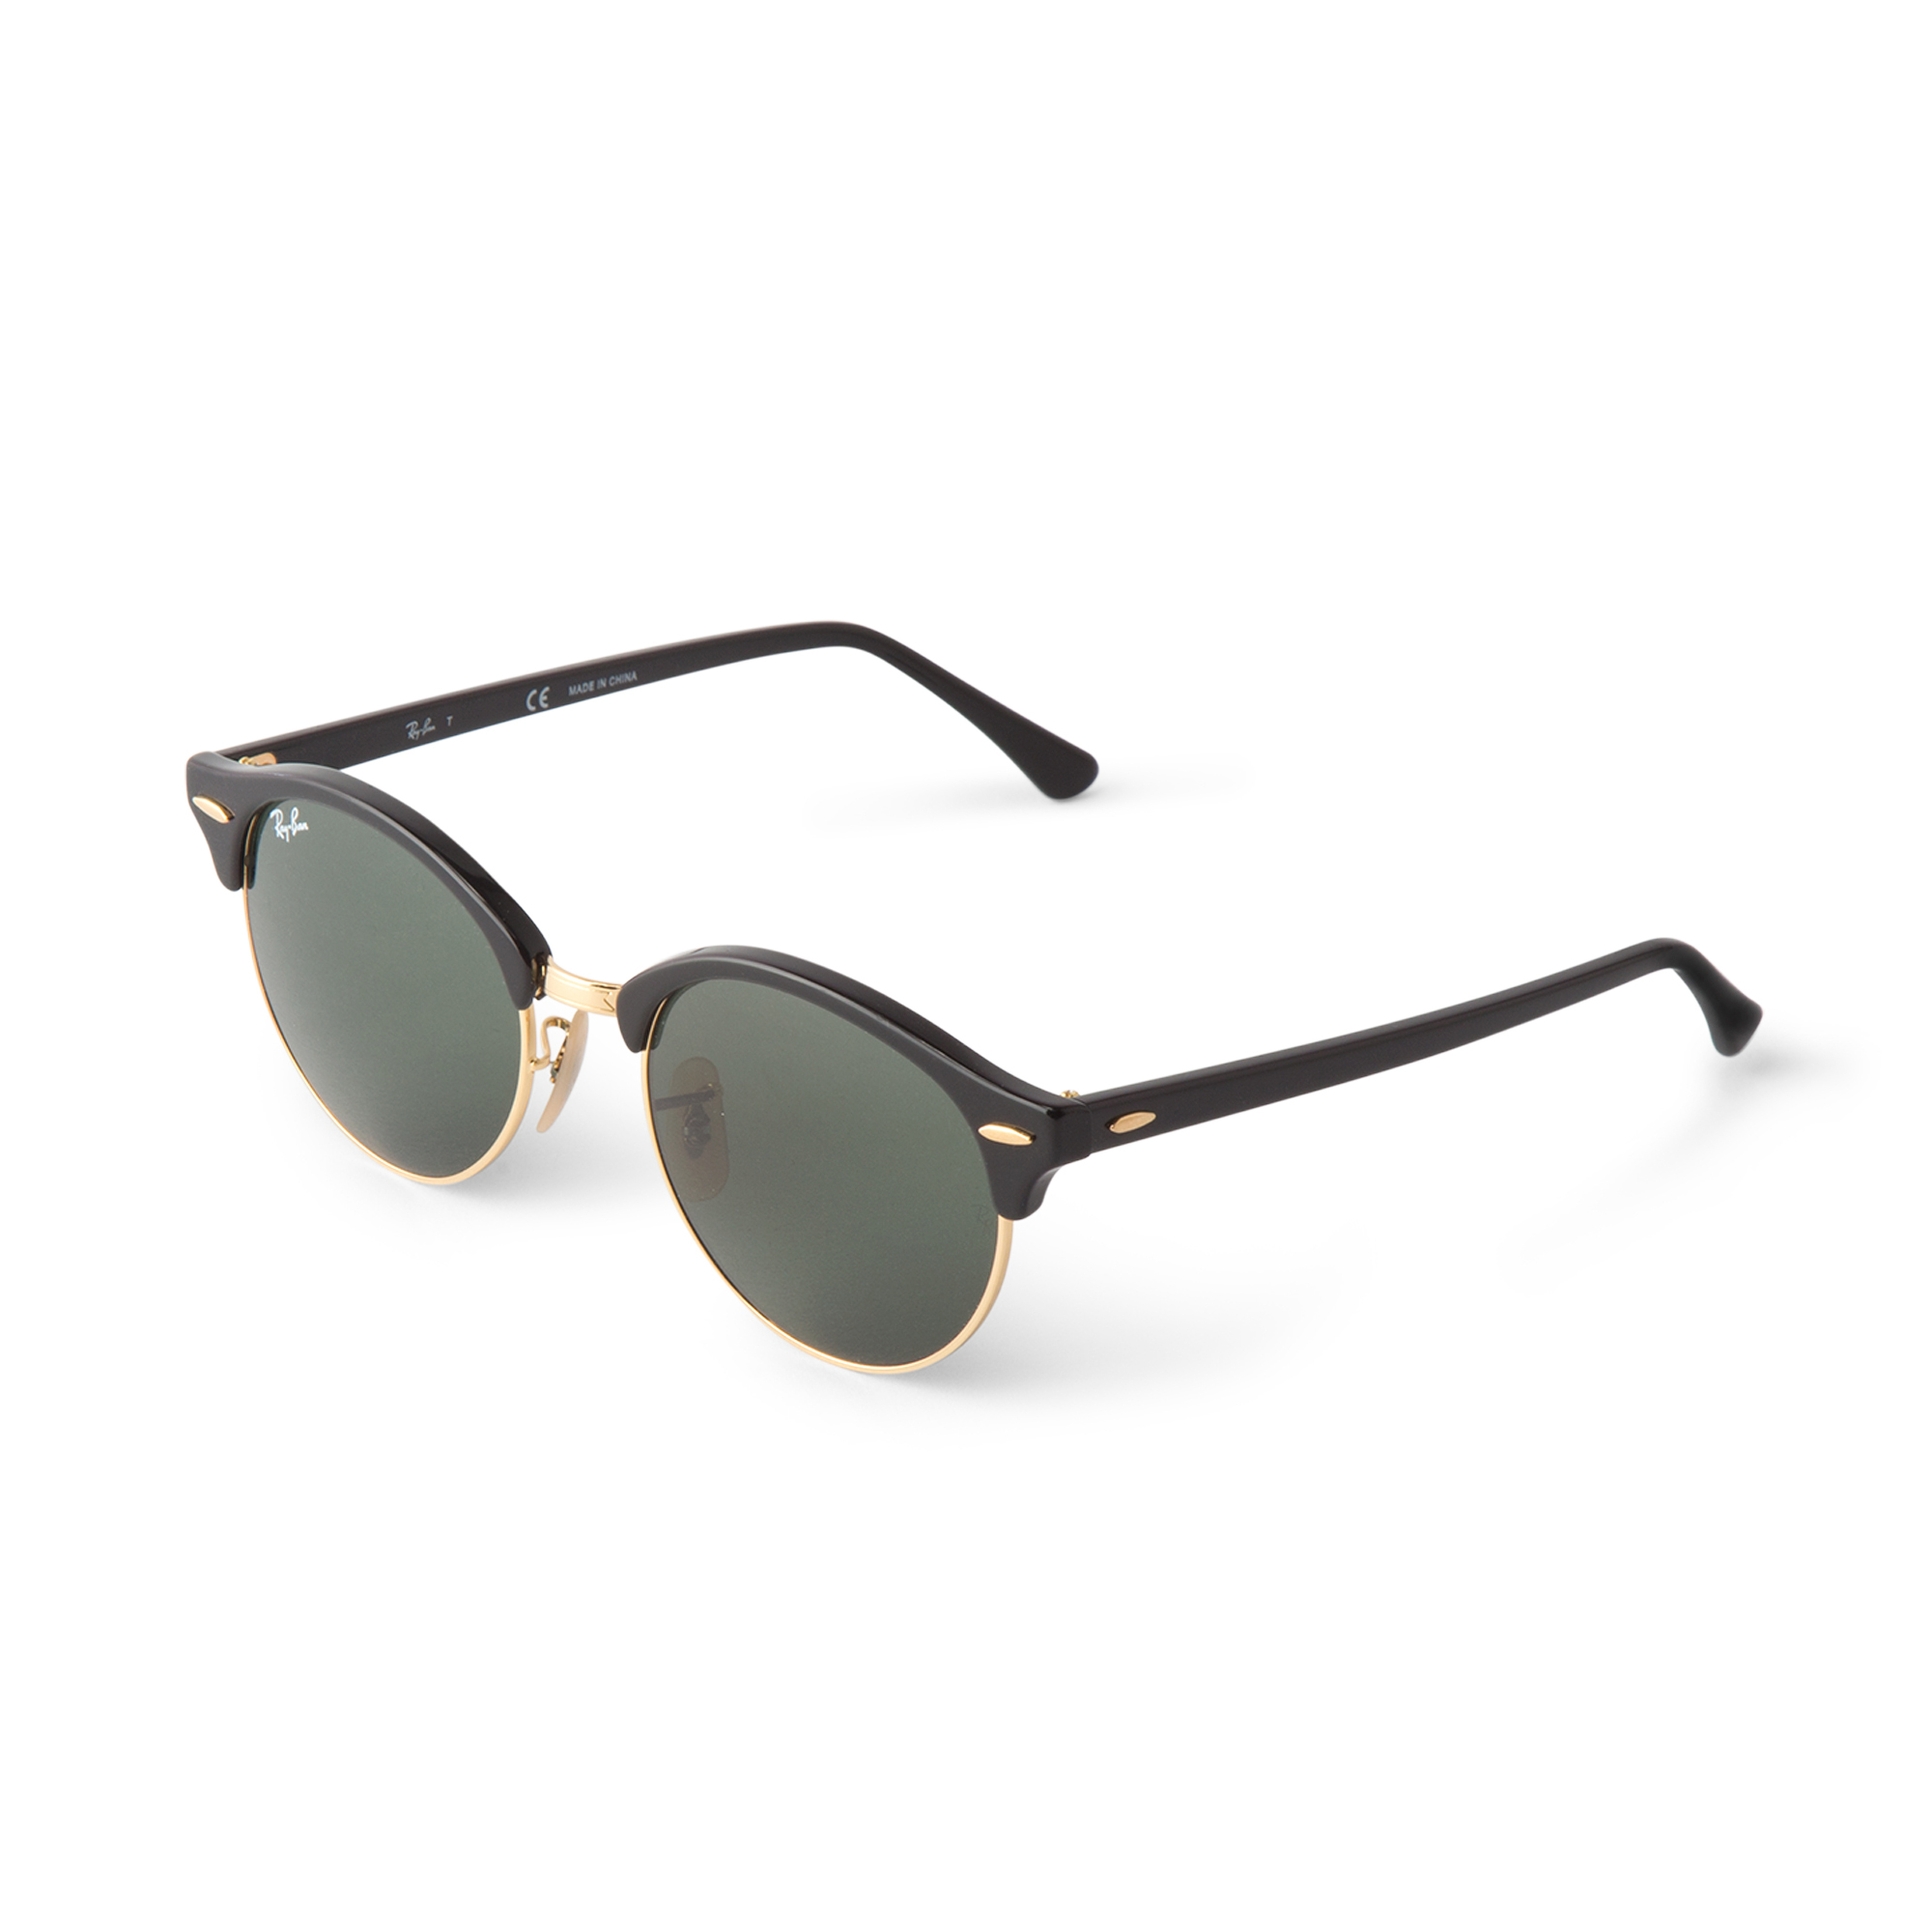 6a35a582d812af Clubround Sunglasses